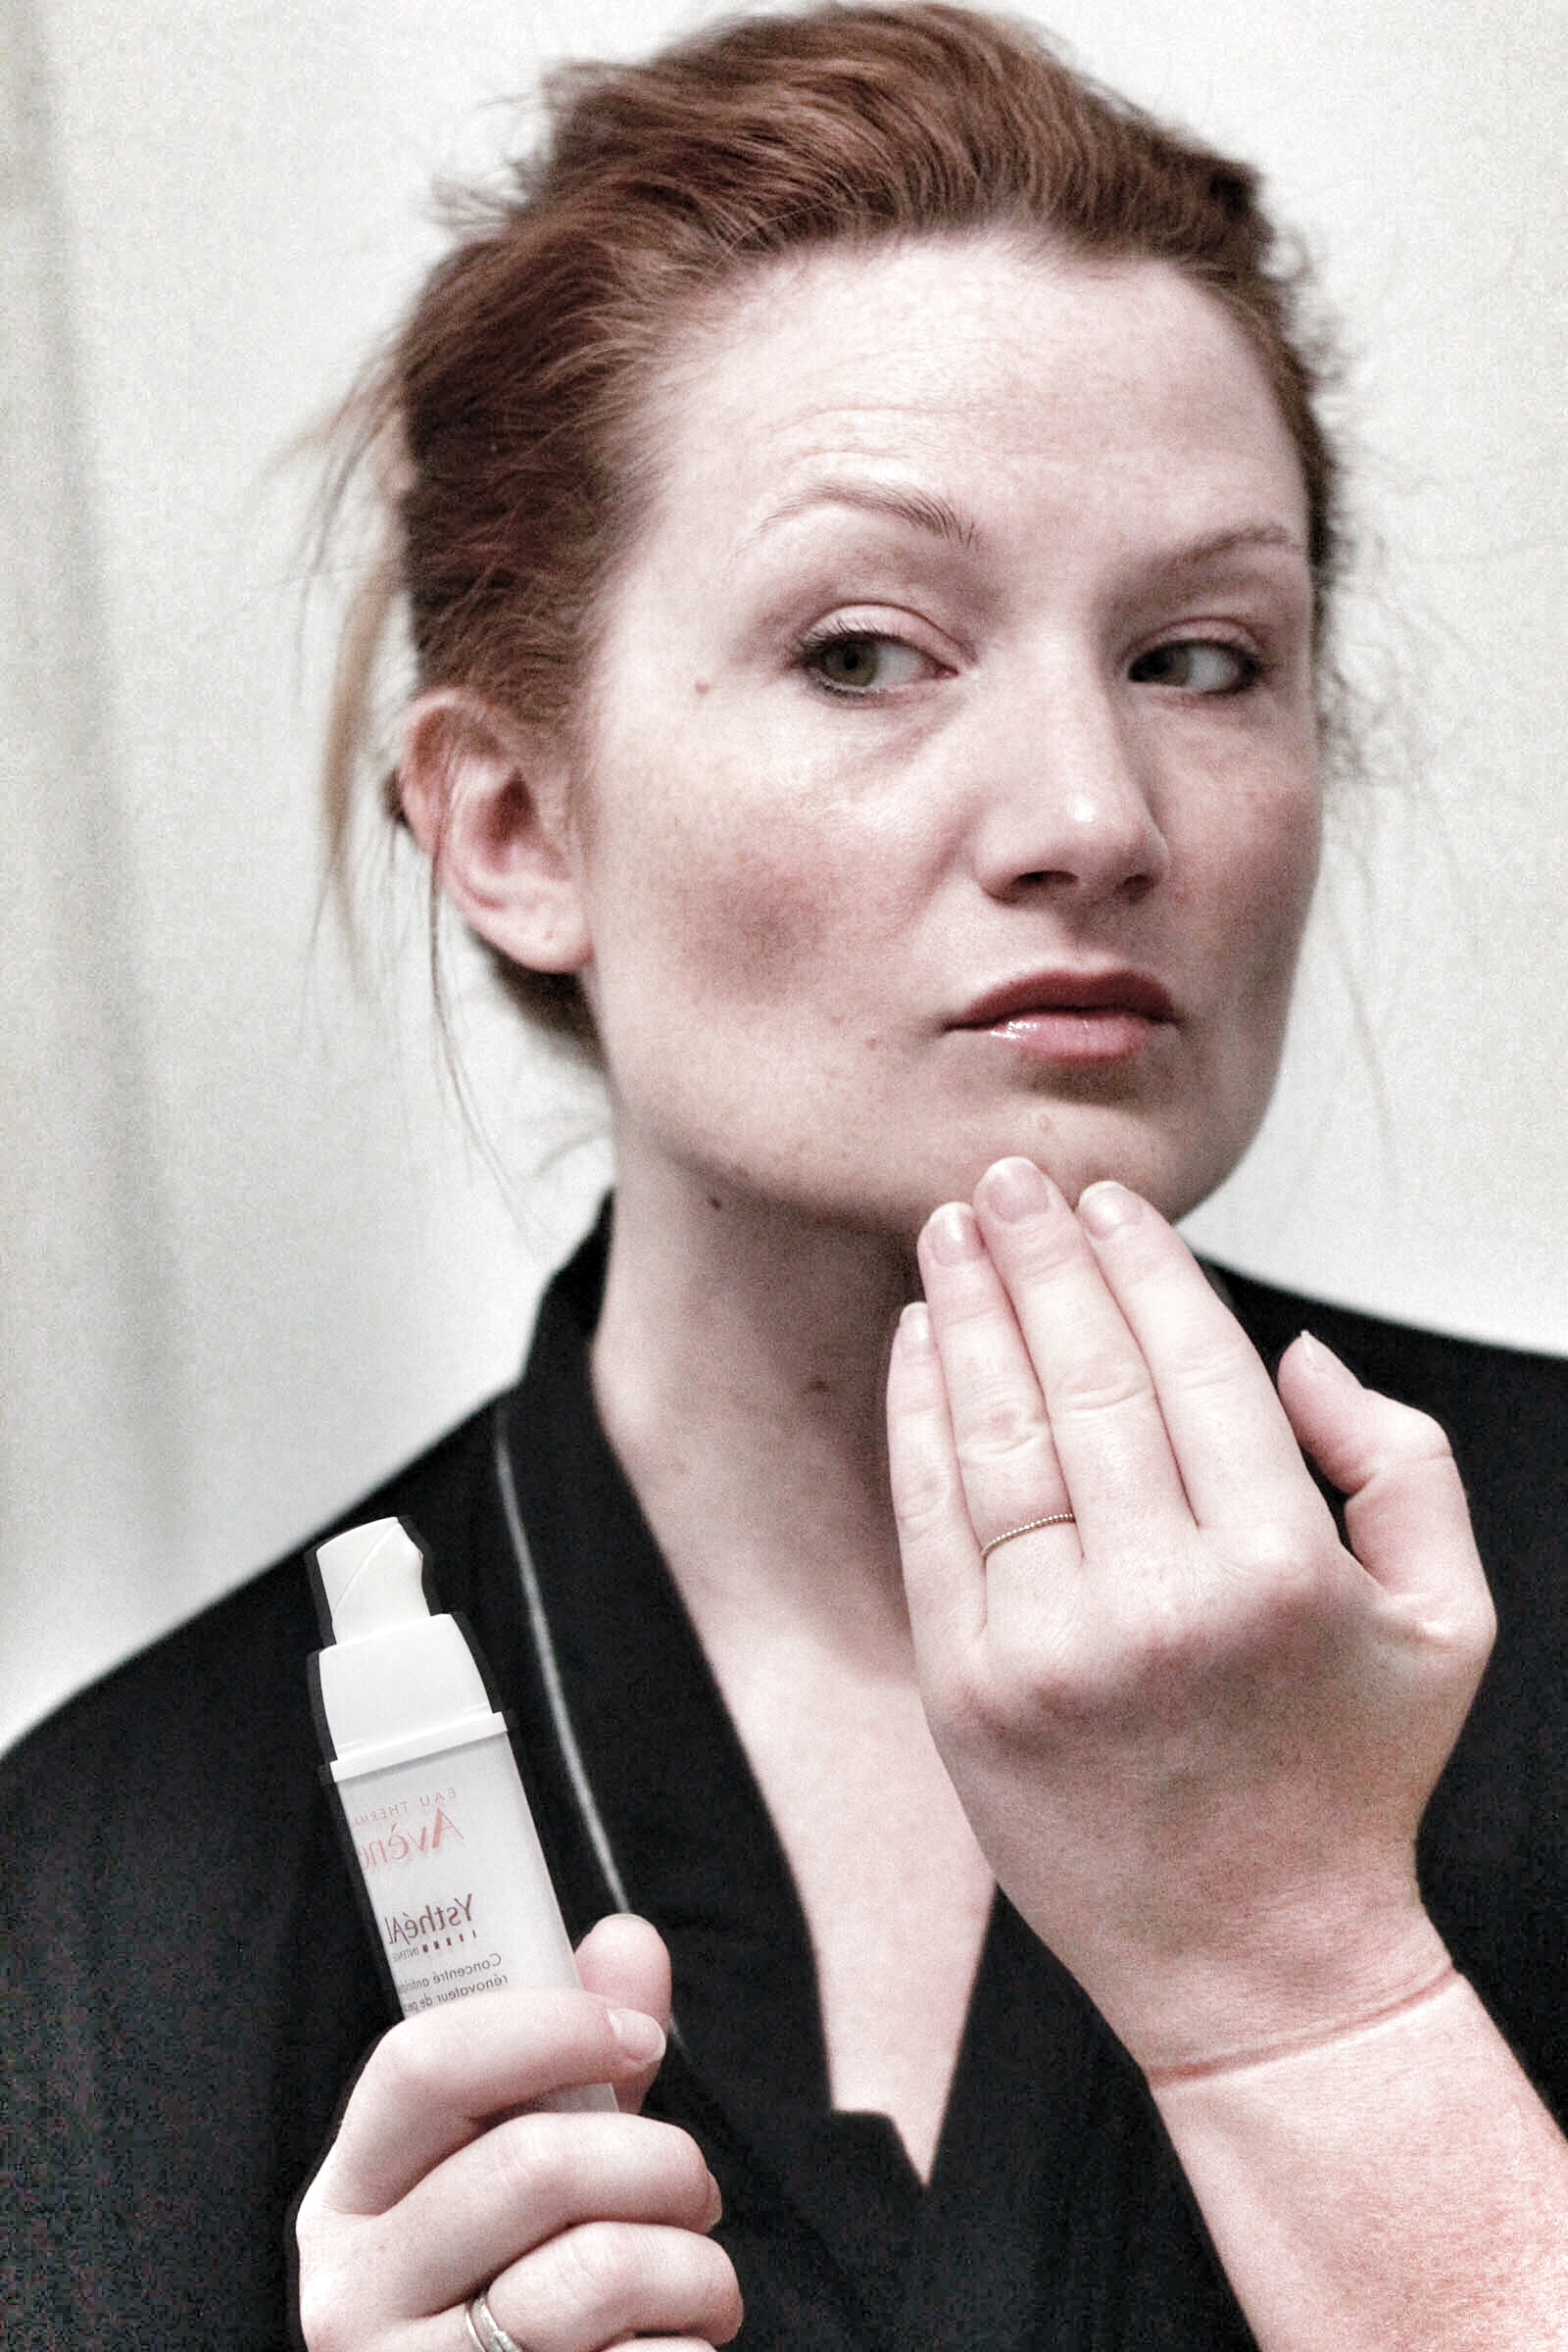 No makeup selfie; applying Avène YsthéAL Intense